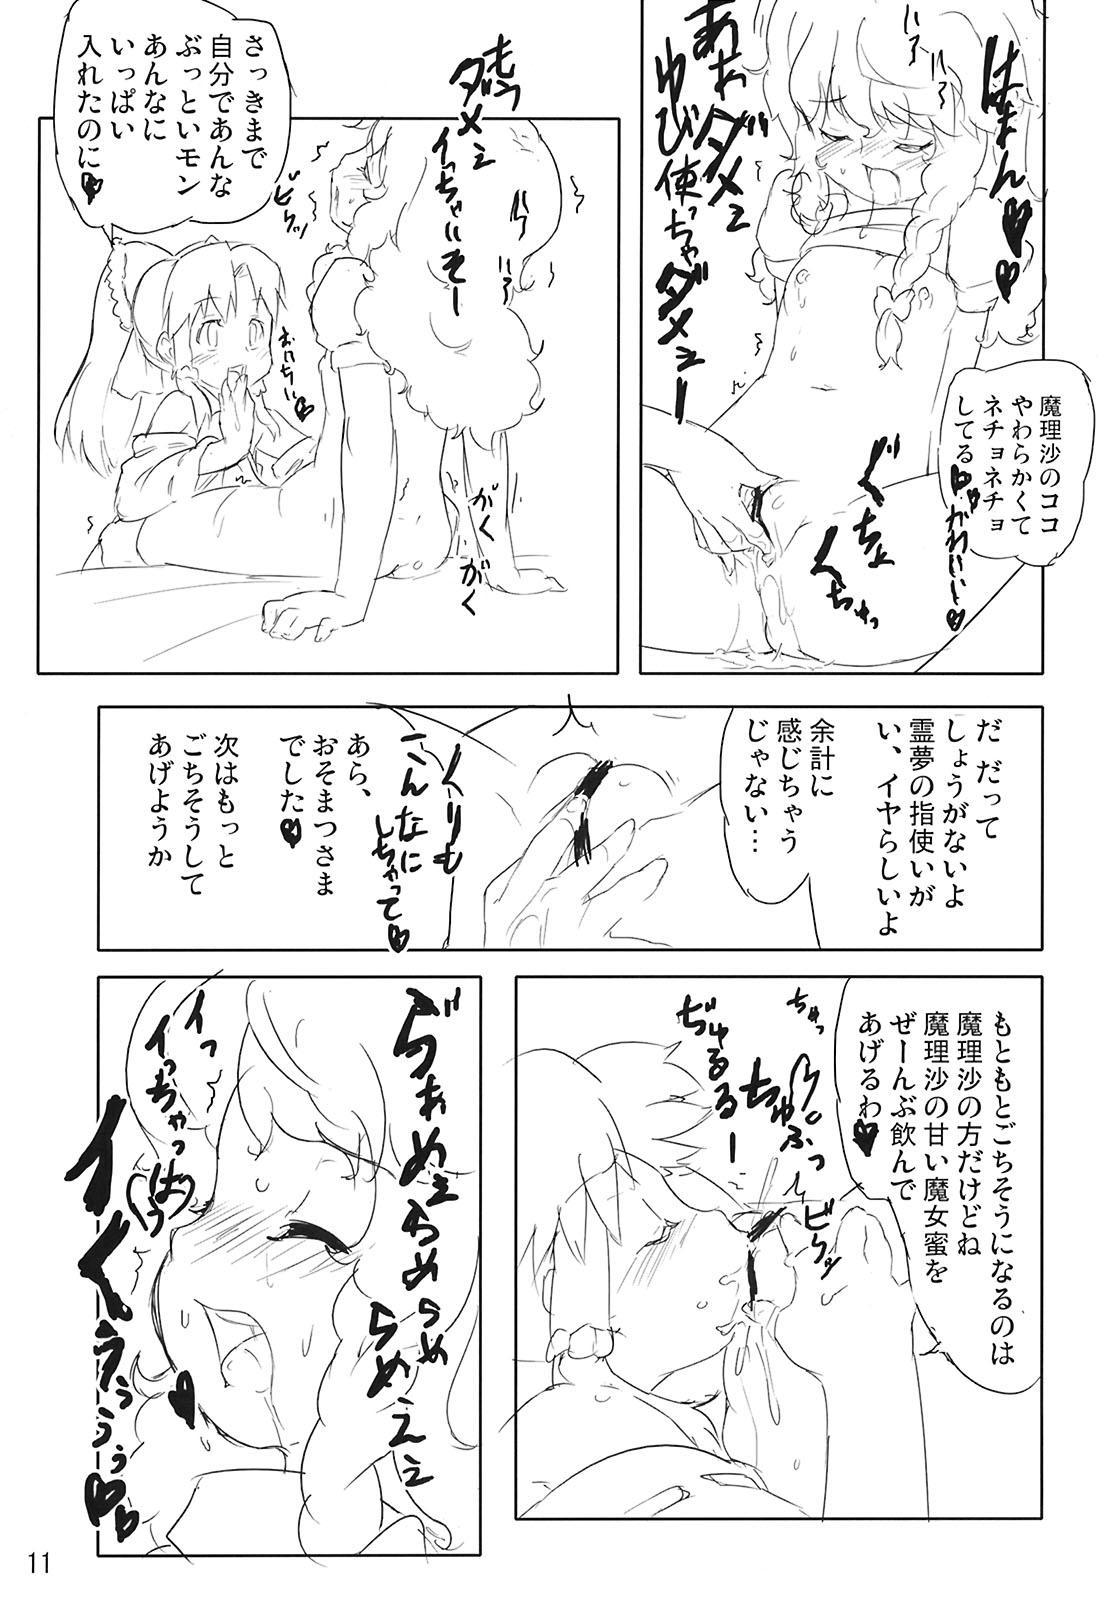 Kirisame Kinoko Jiken - cream of mushroom soup 10